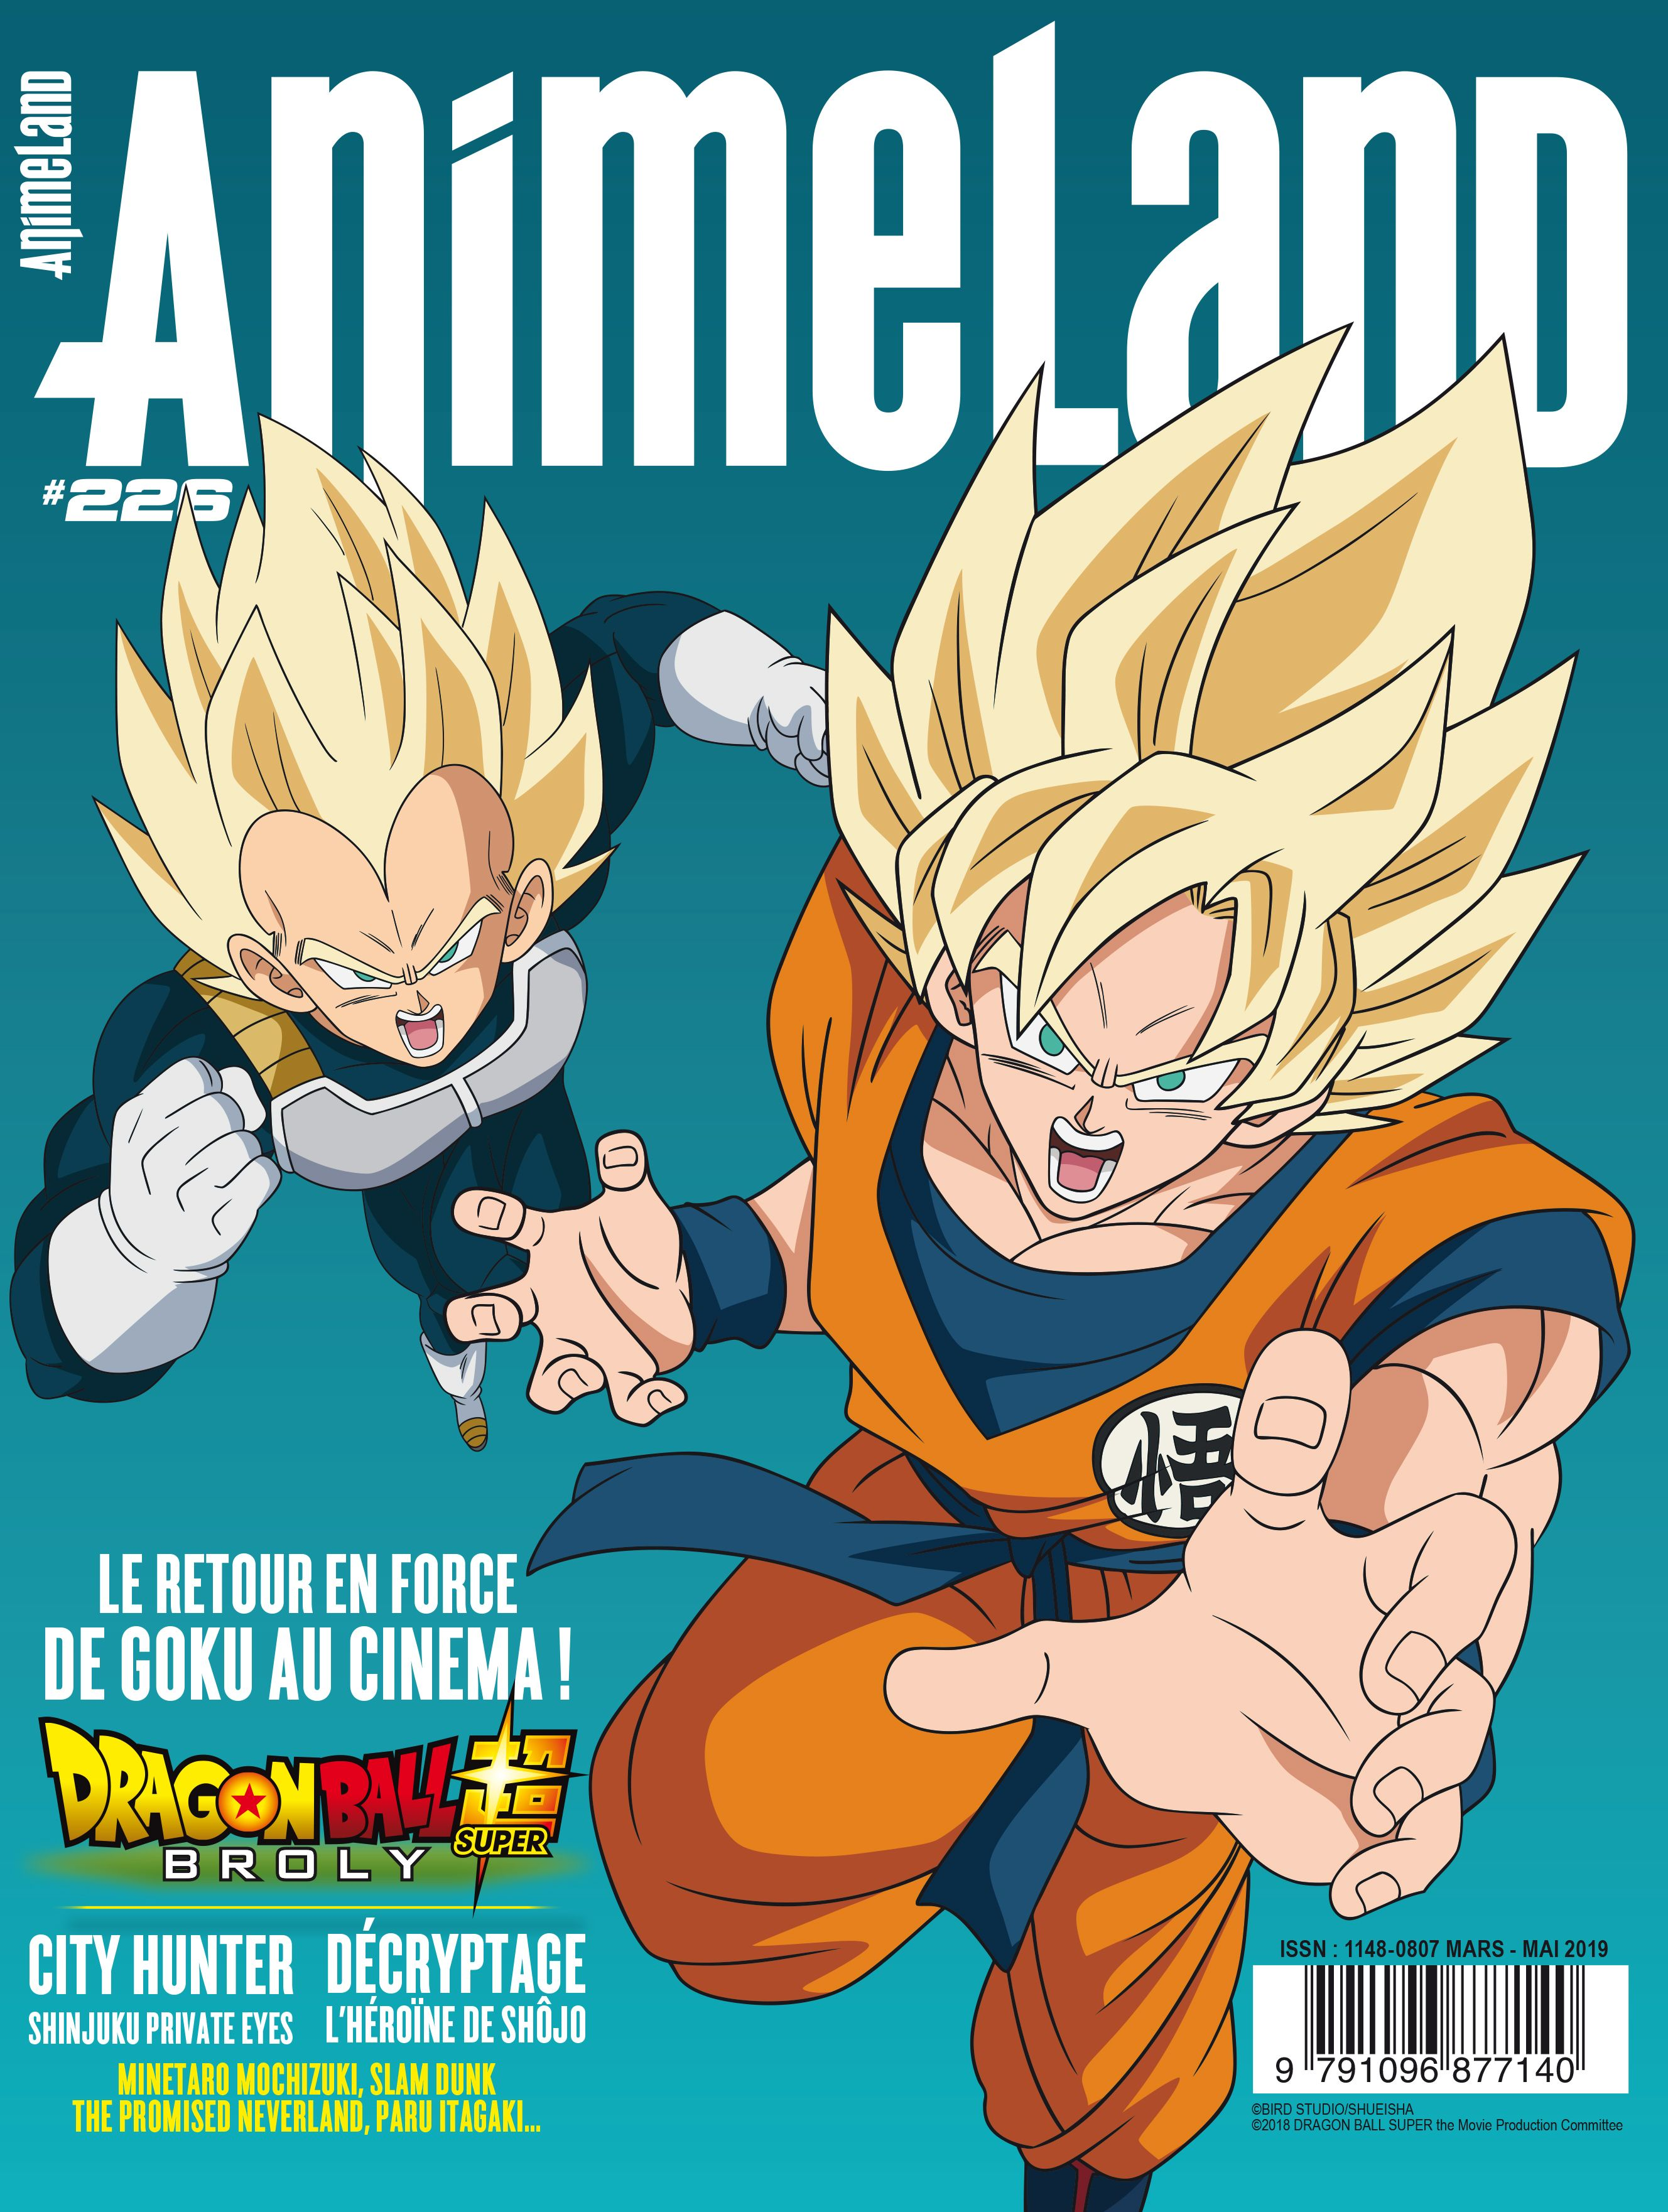 Animeland Vol.226